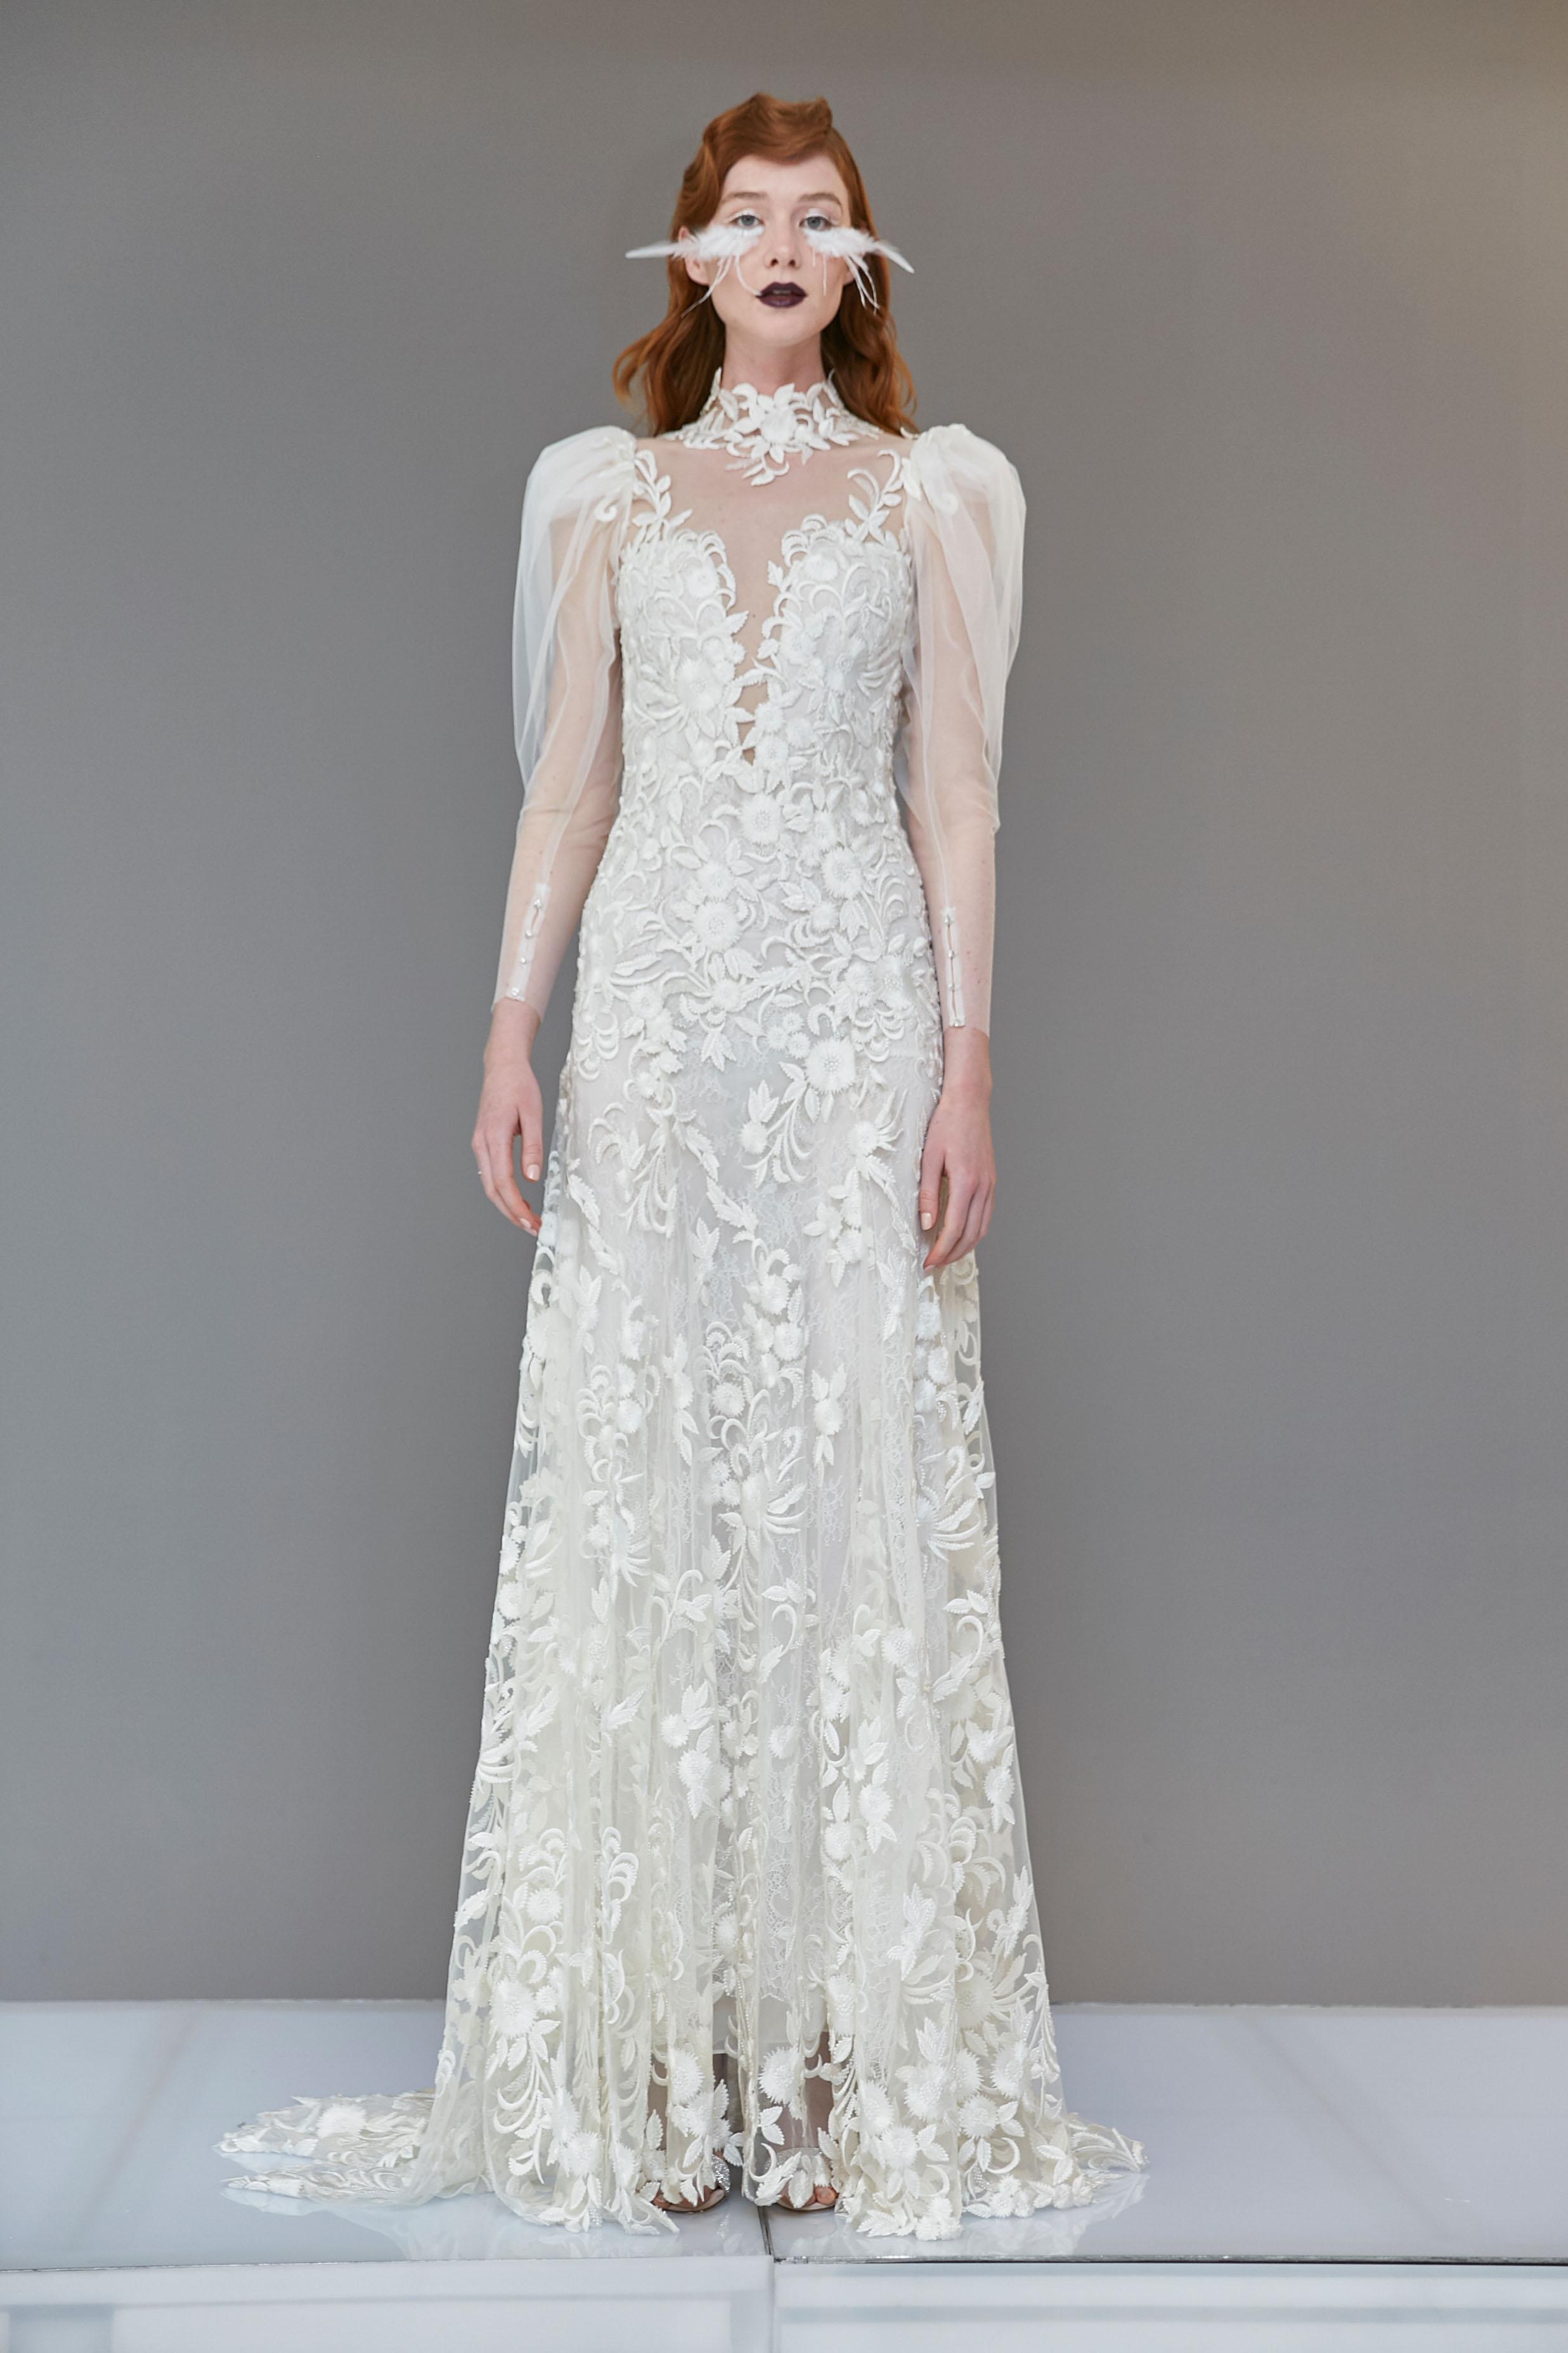 lace sheer high neck puffed long sleeves a-line wedding dress Francesca Miranda Spring 2020